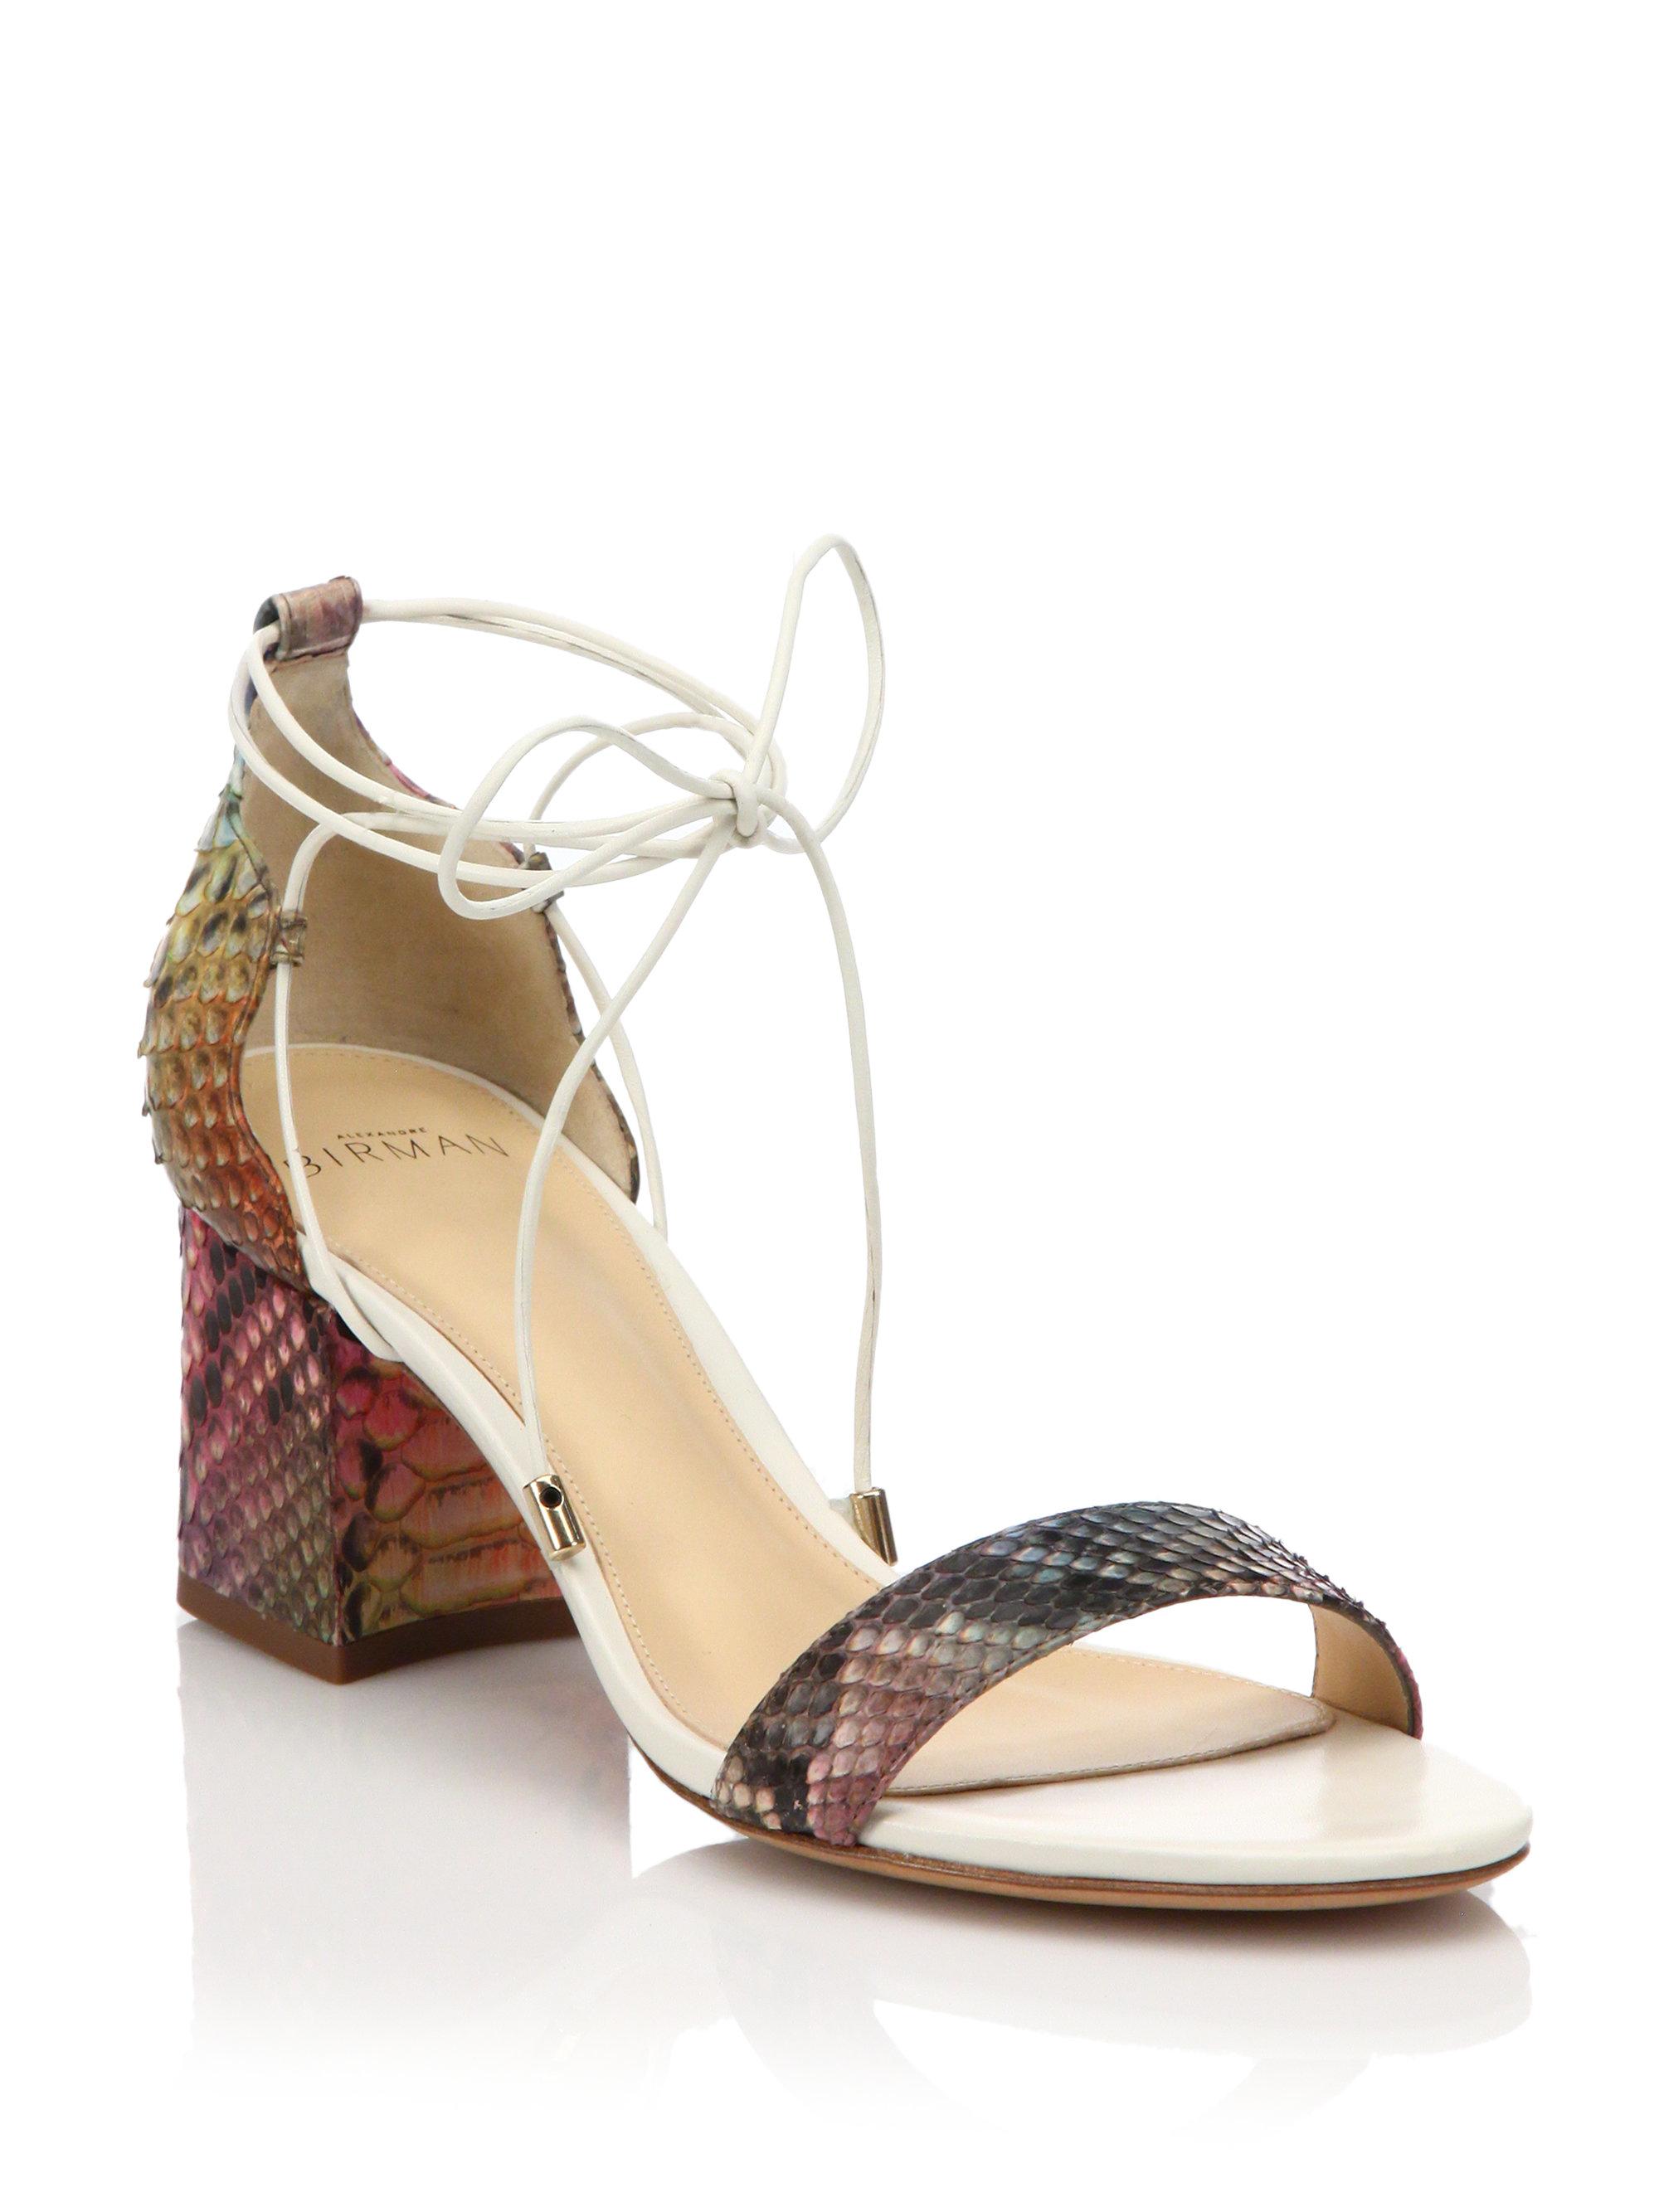 5410339e507 Lyst - Alexandre Birman Rainbow Python Lace-up Mid-heel Sandals